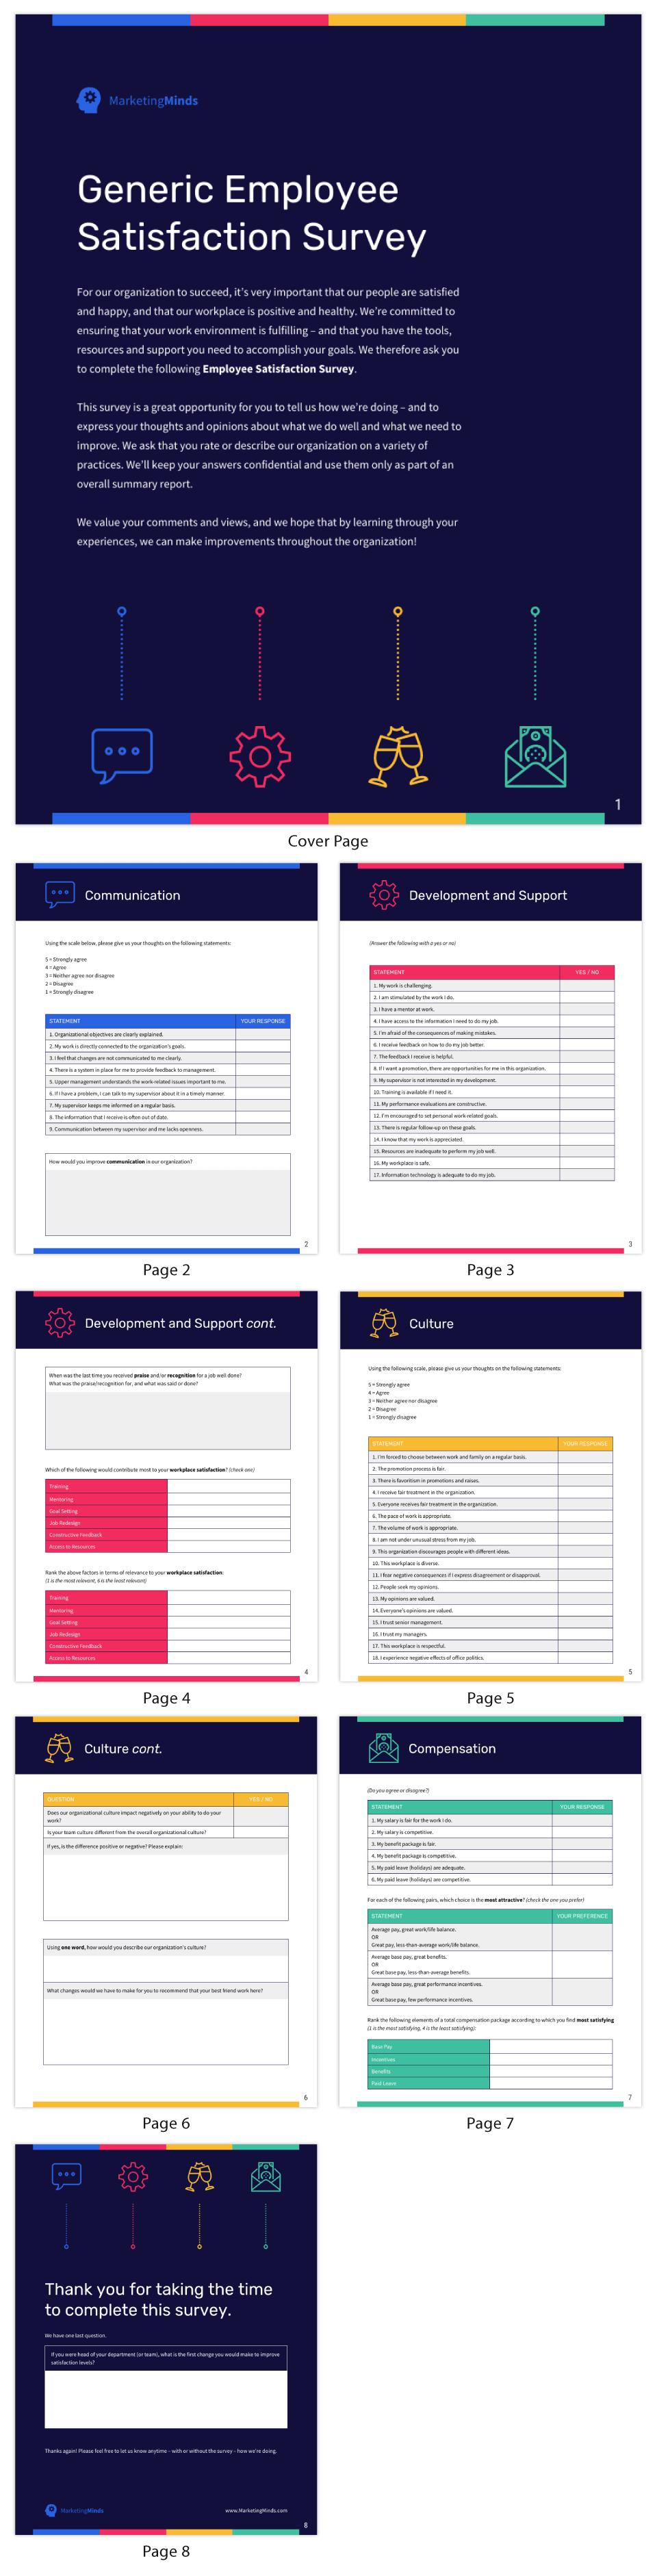 Generic Employee Satisfaction Survey Checklist Template